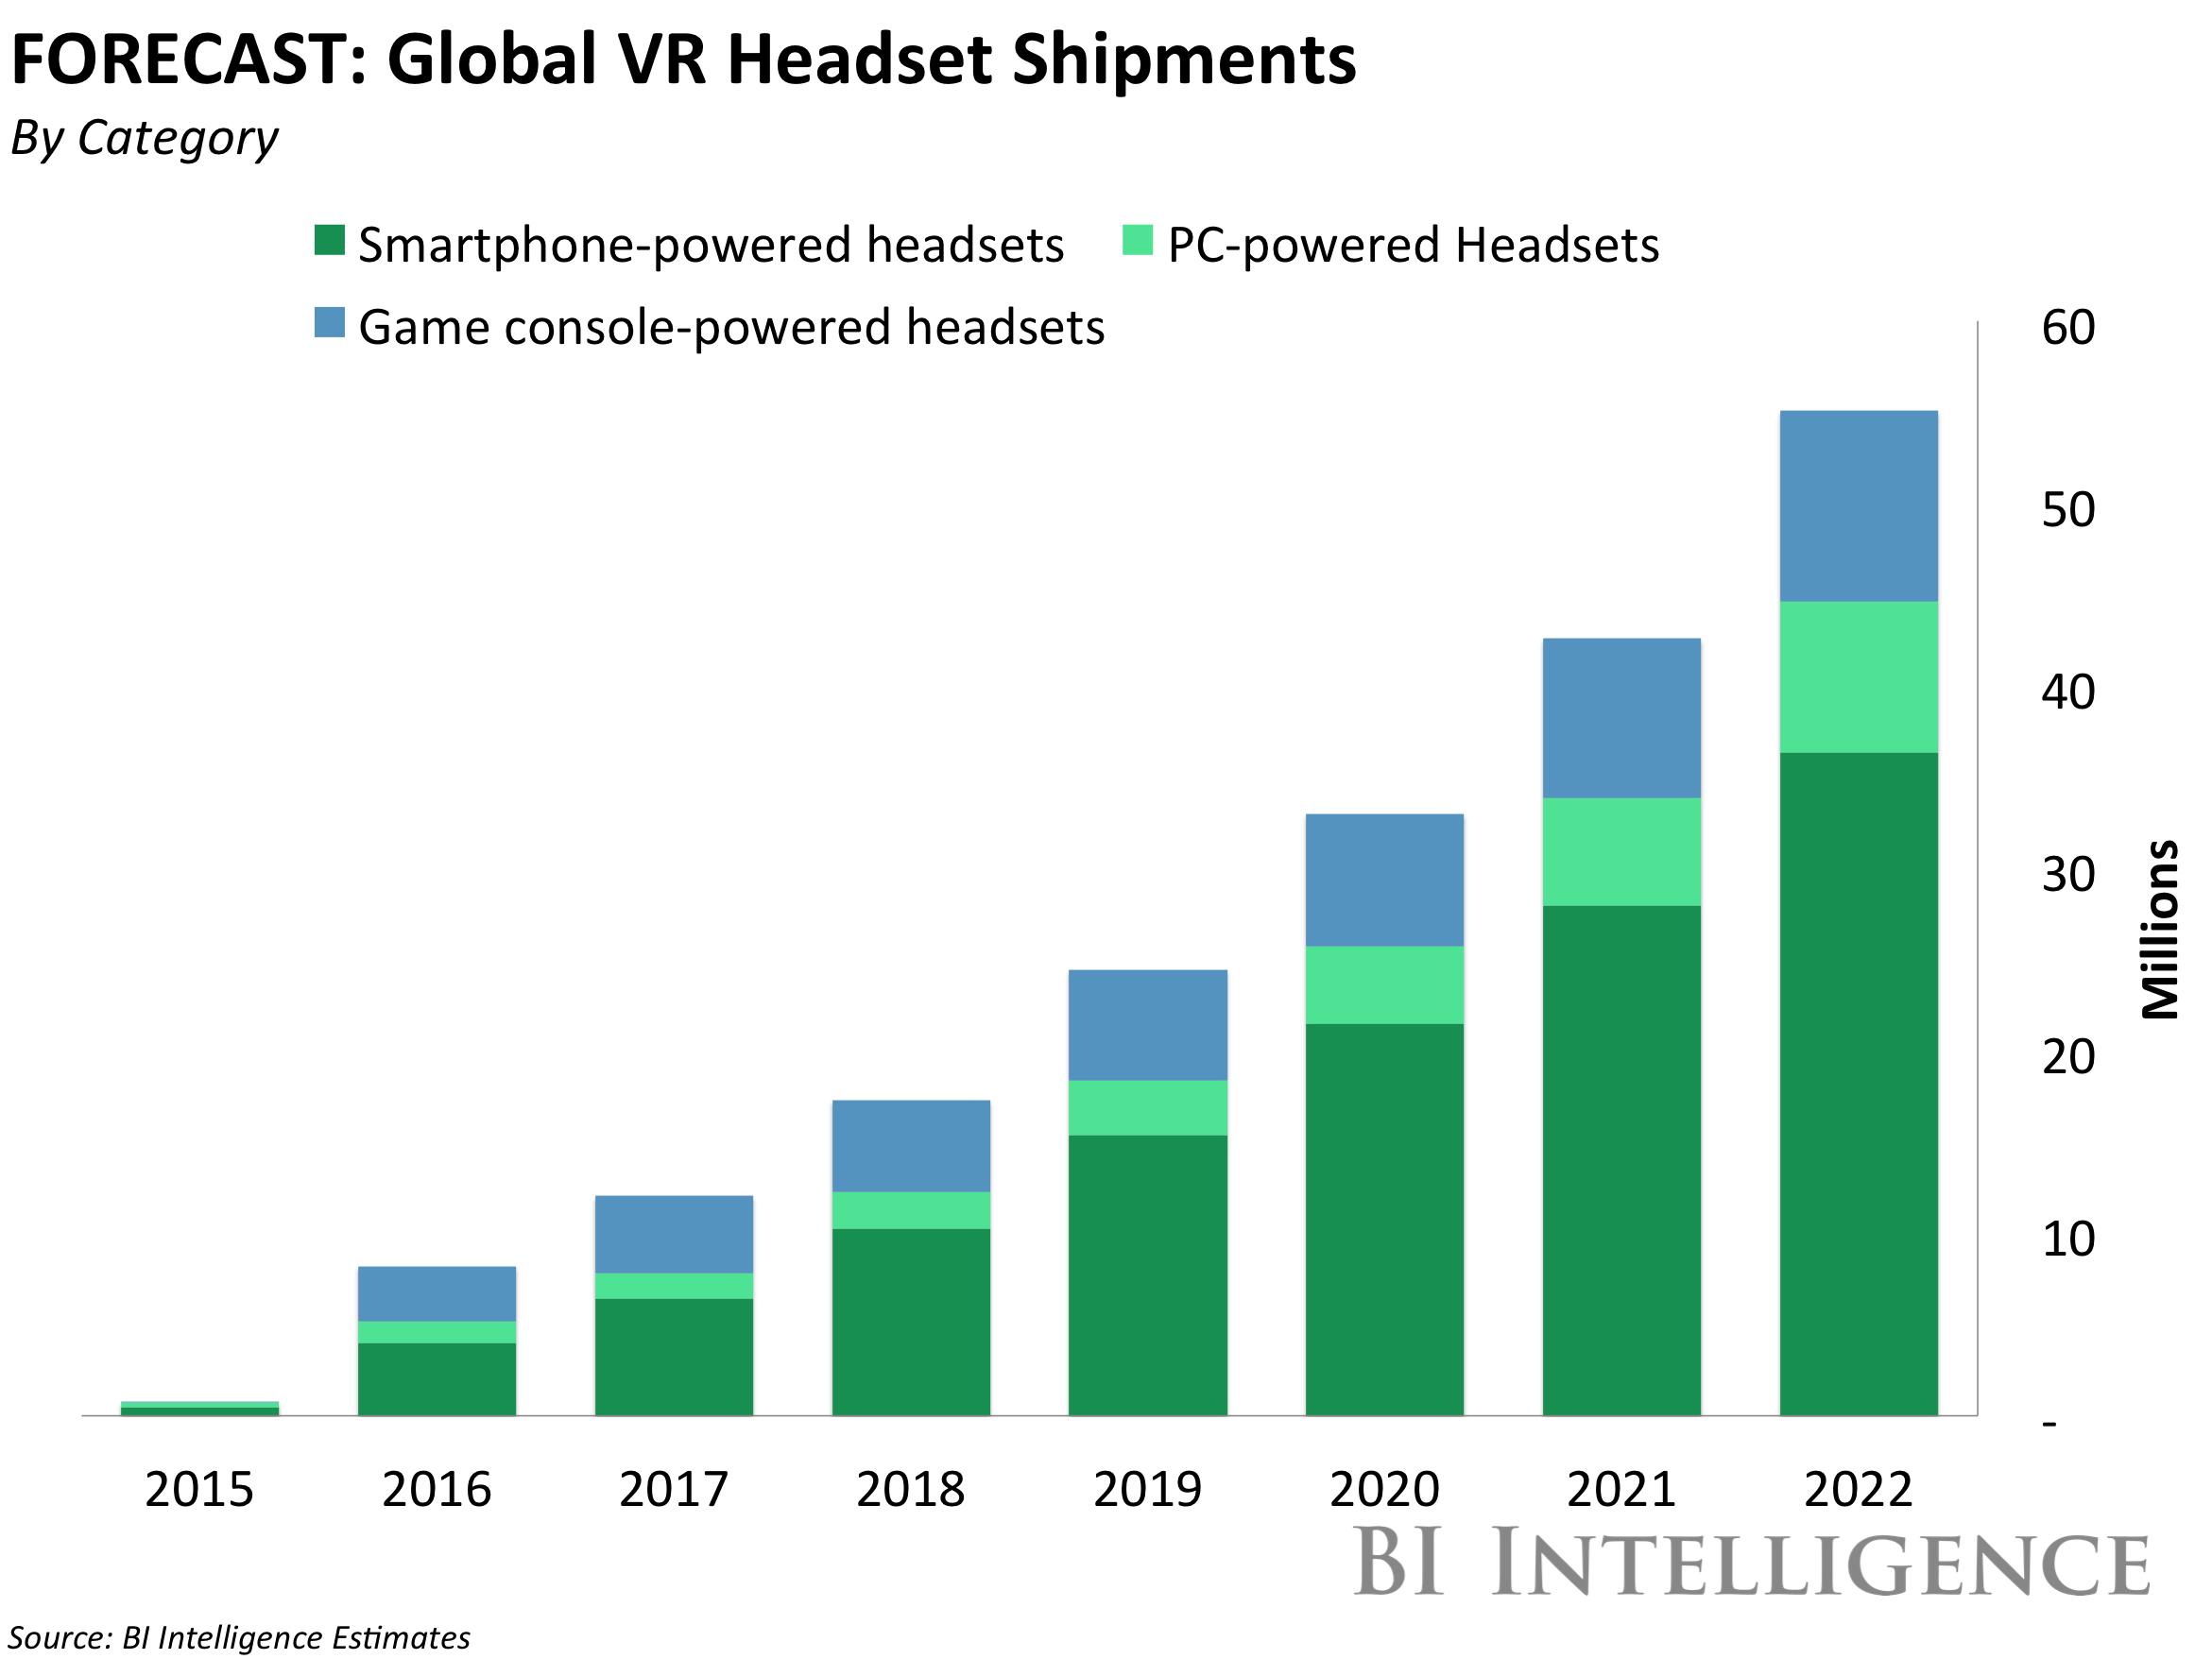 VR Headset Shipments Graph -Trend 2017